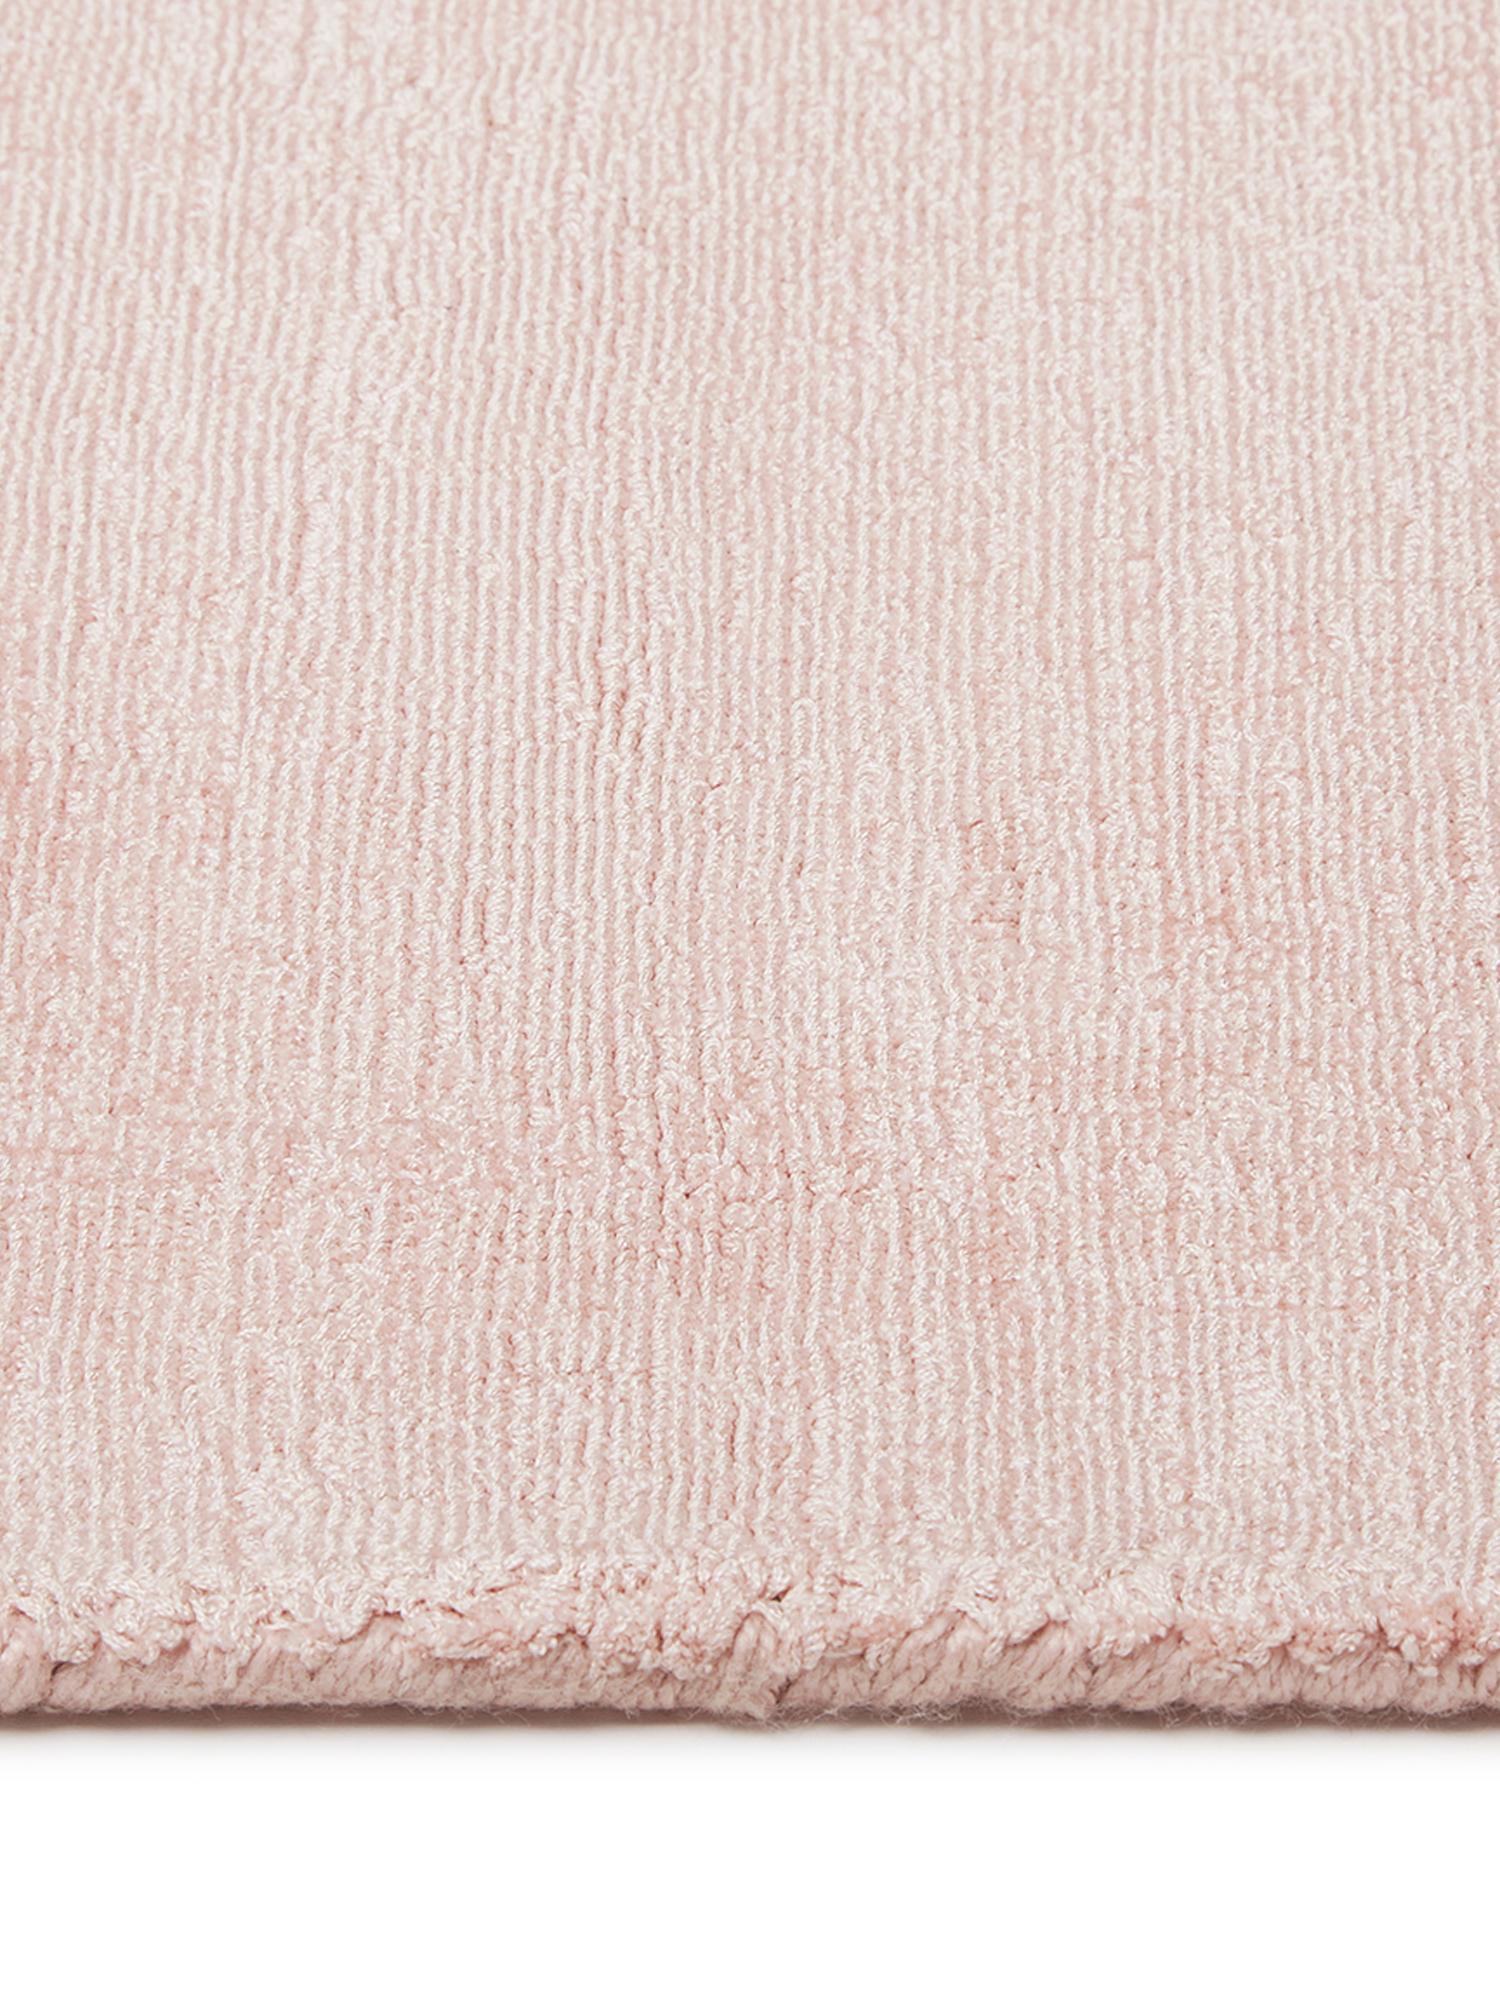 Handgewebter Viskoseteppich Jane in Rosa, Flor: 100% Viskose, Rosa, B 160 x L 230 cm (Grösse M)